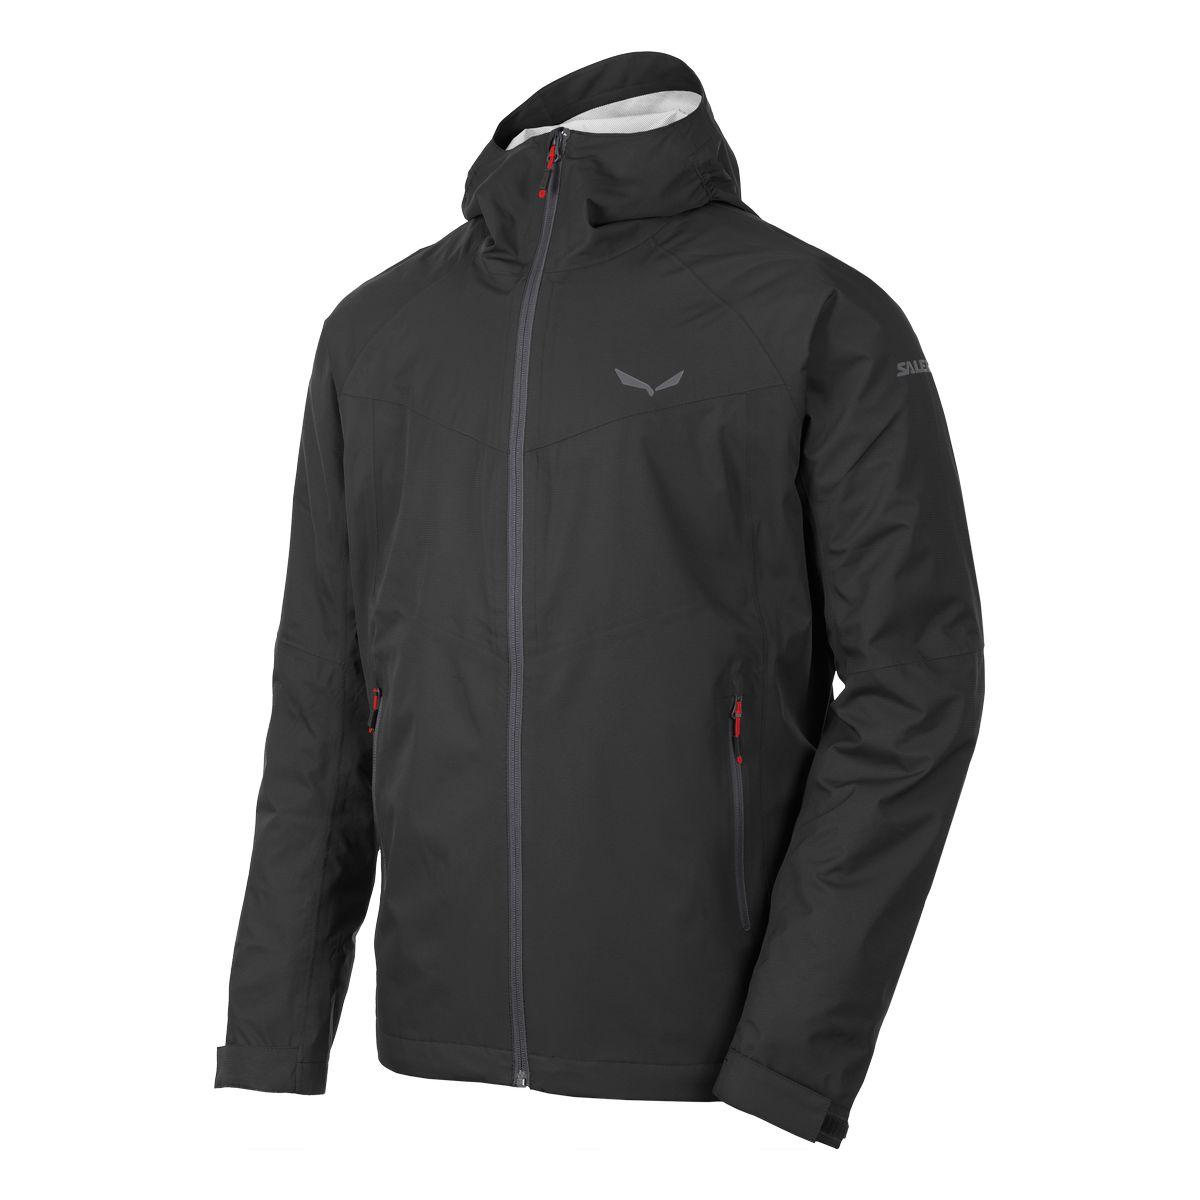 Куртка для активного отдыха Salewa 2016 PUEZ (AQUA 3) PTX M JKT black out/0730